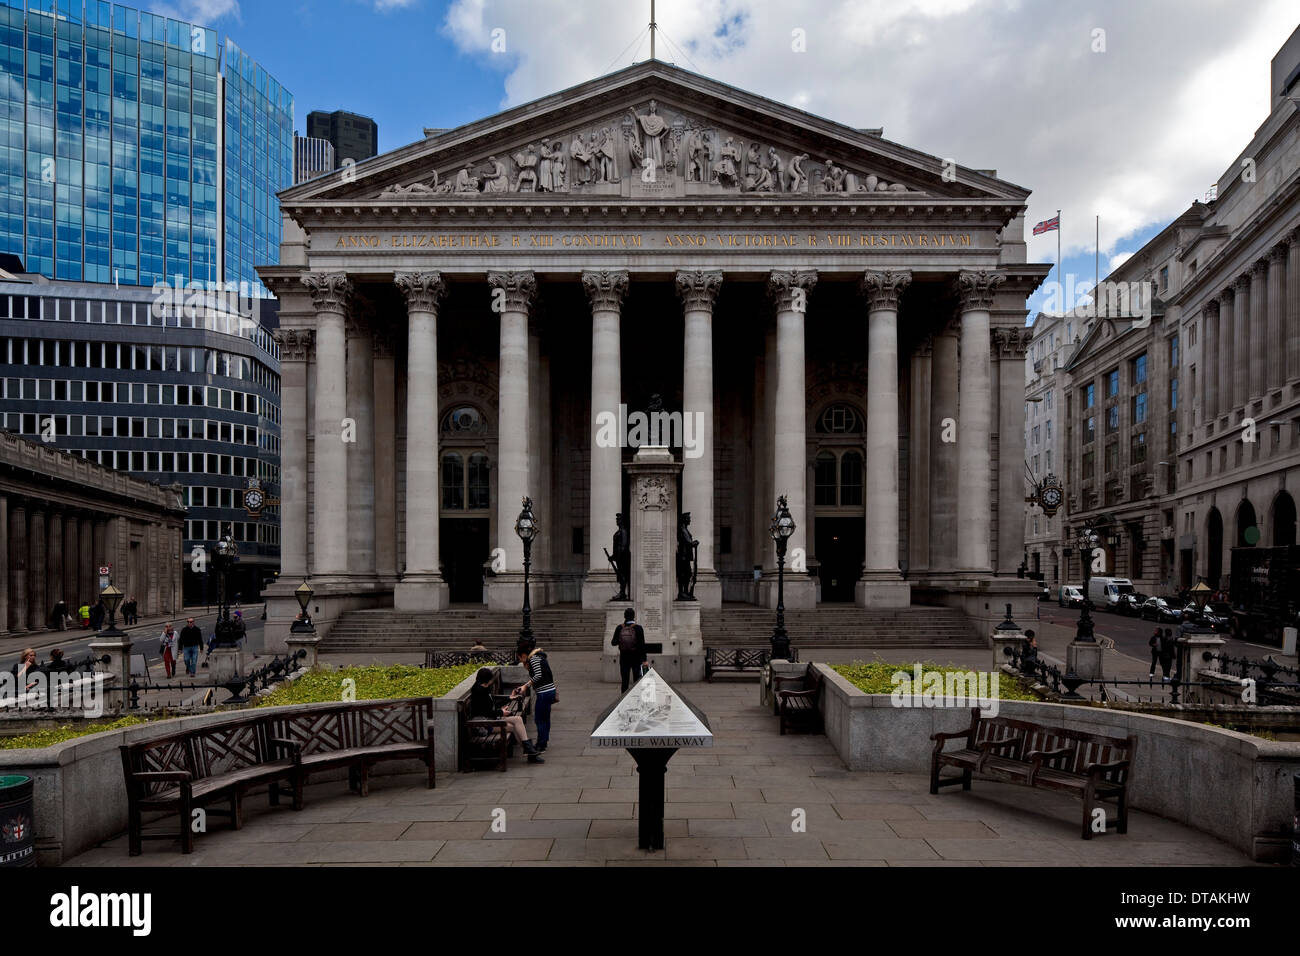 London, Royal Exchange - Stock Image